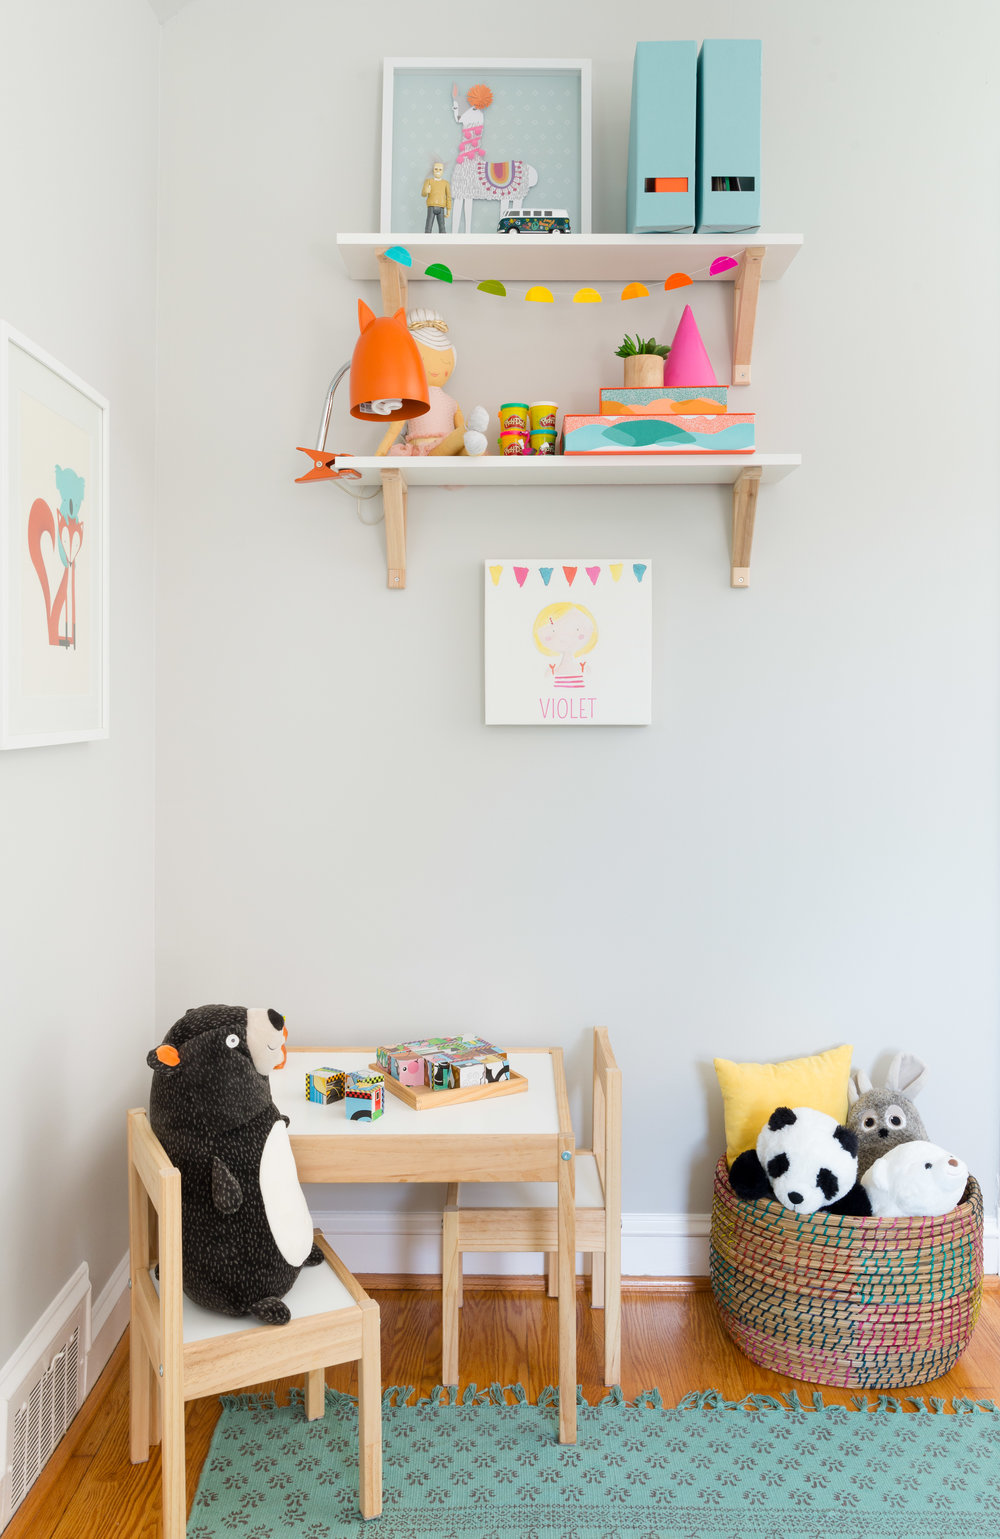 kid-bedroom-sligo-ave-washington-dc-sanabria-and-co-interior-design-studio-21.jpg